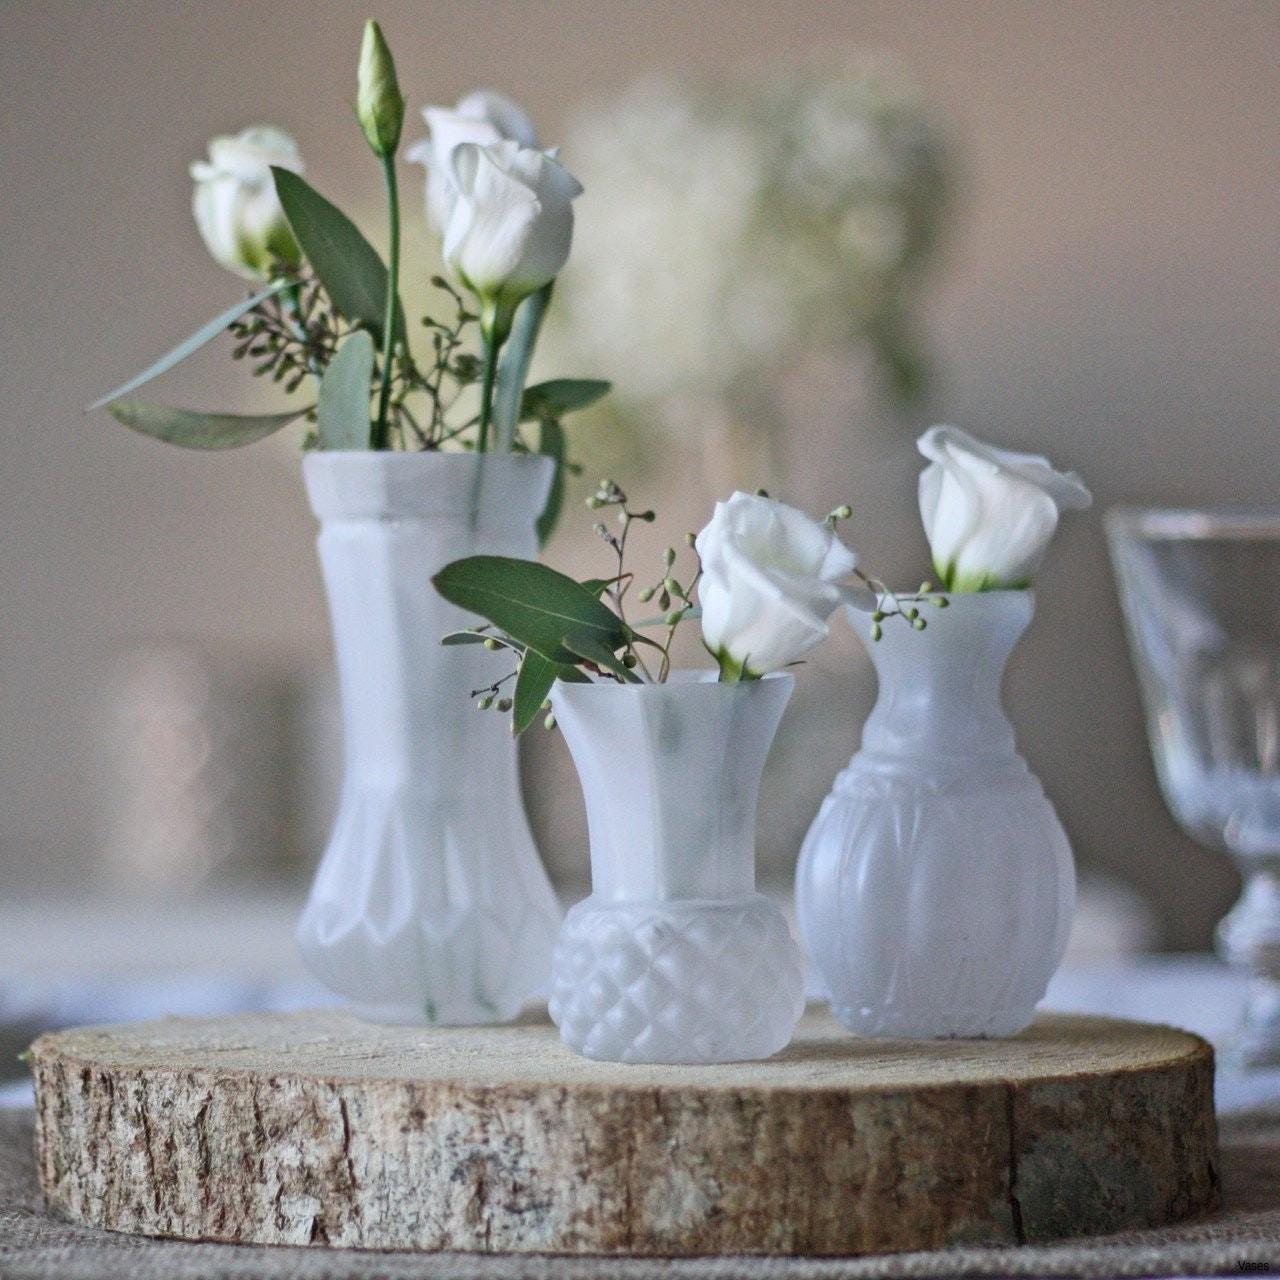 vase with sticks of wedding flower decoration cost fresh jar flower 1h vases bud wedding within wedding flower decoration cost fresh jar flower 1h vases bud wedding vase centerpiece idea i 0